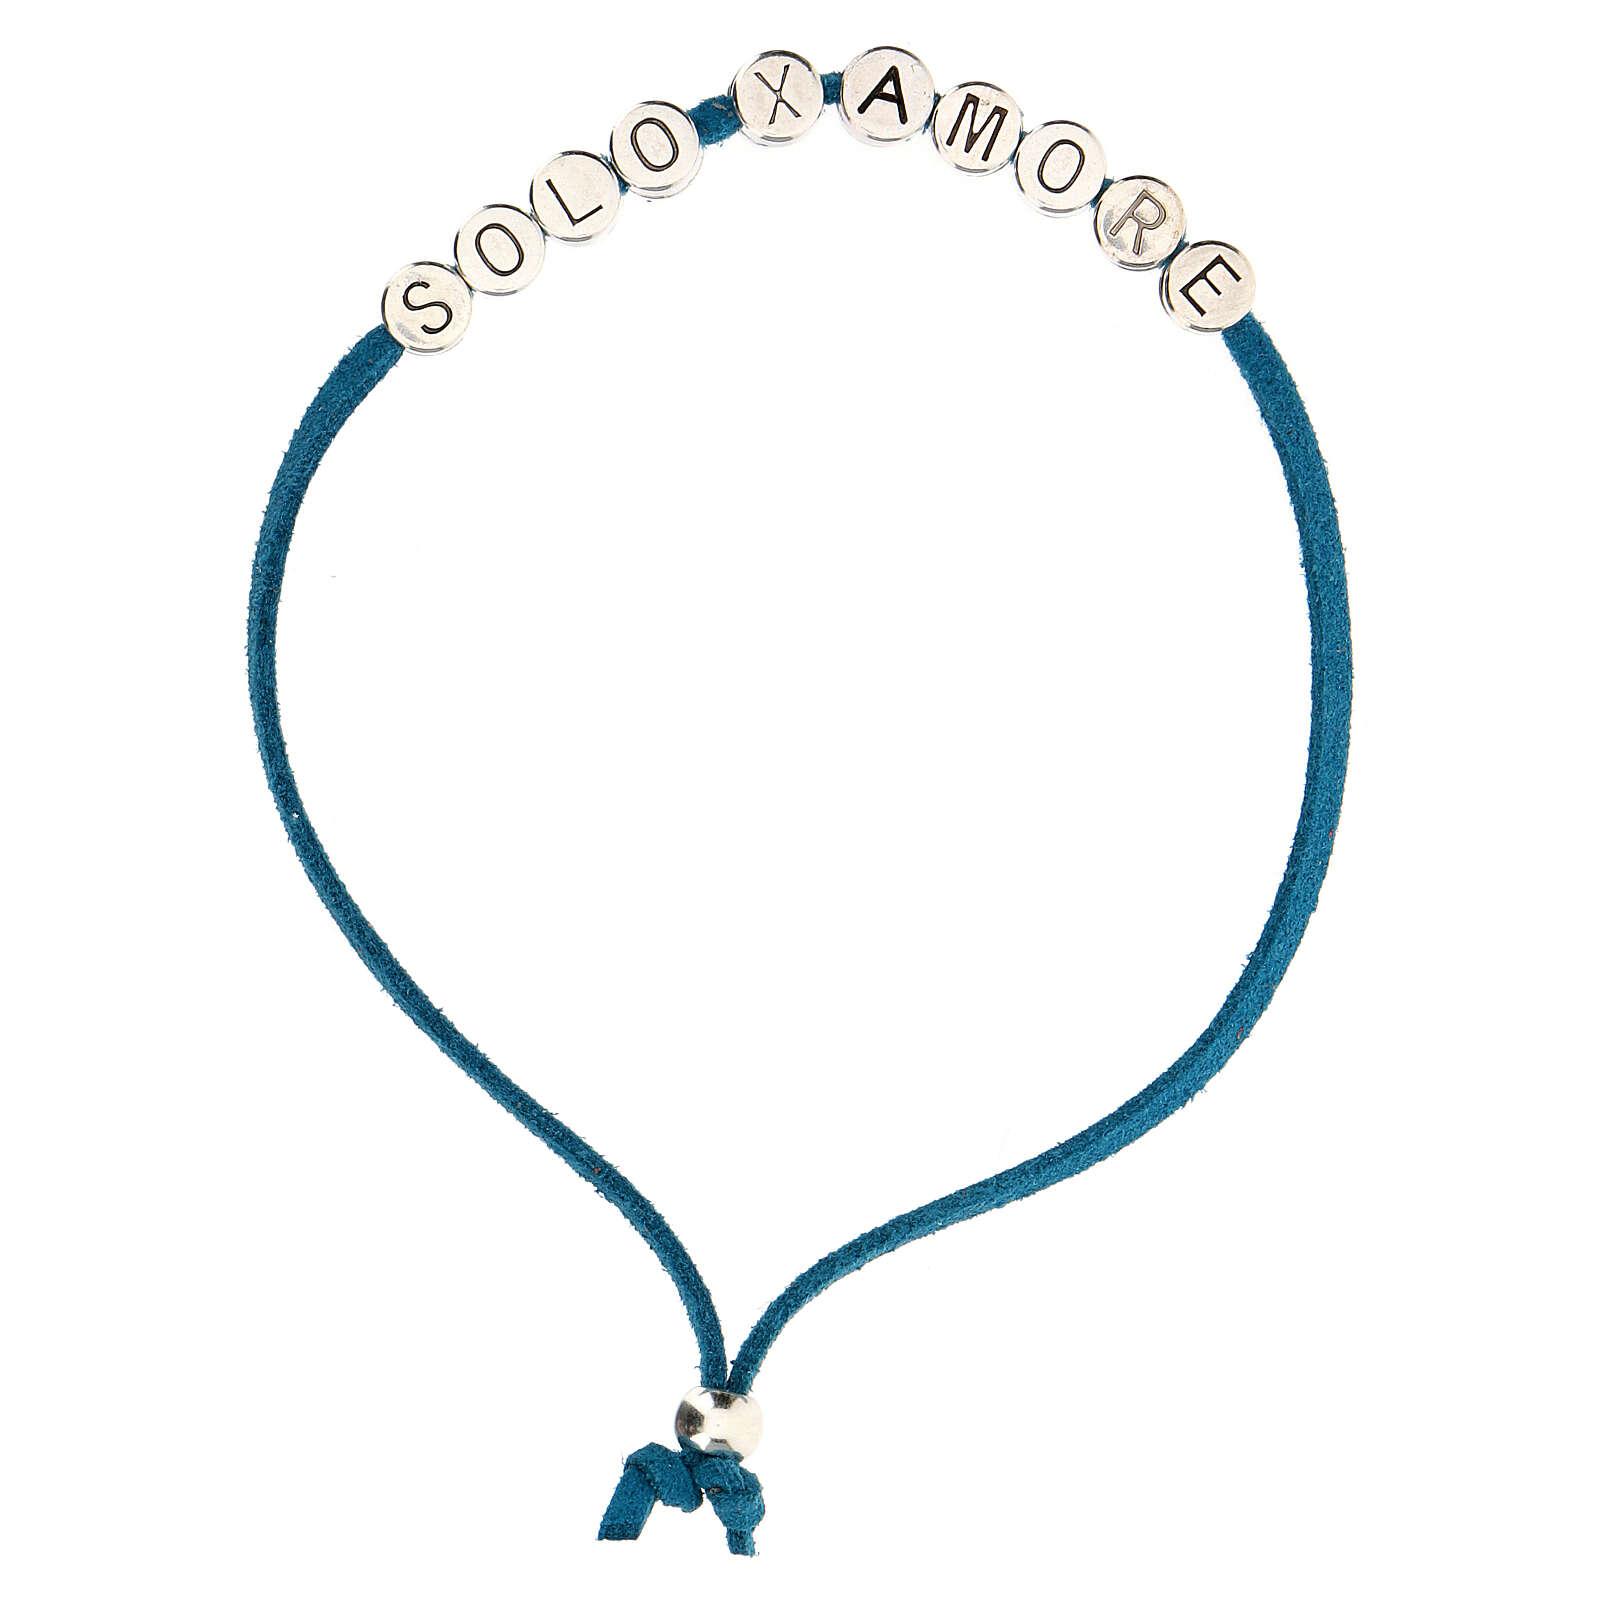 Bracelet Solo X Amore, in turquoise alcantara 4